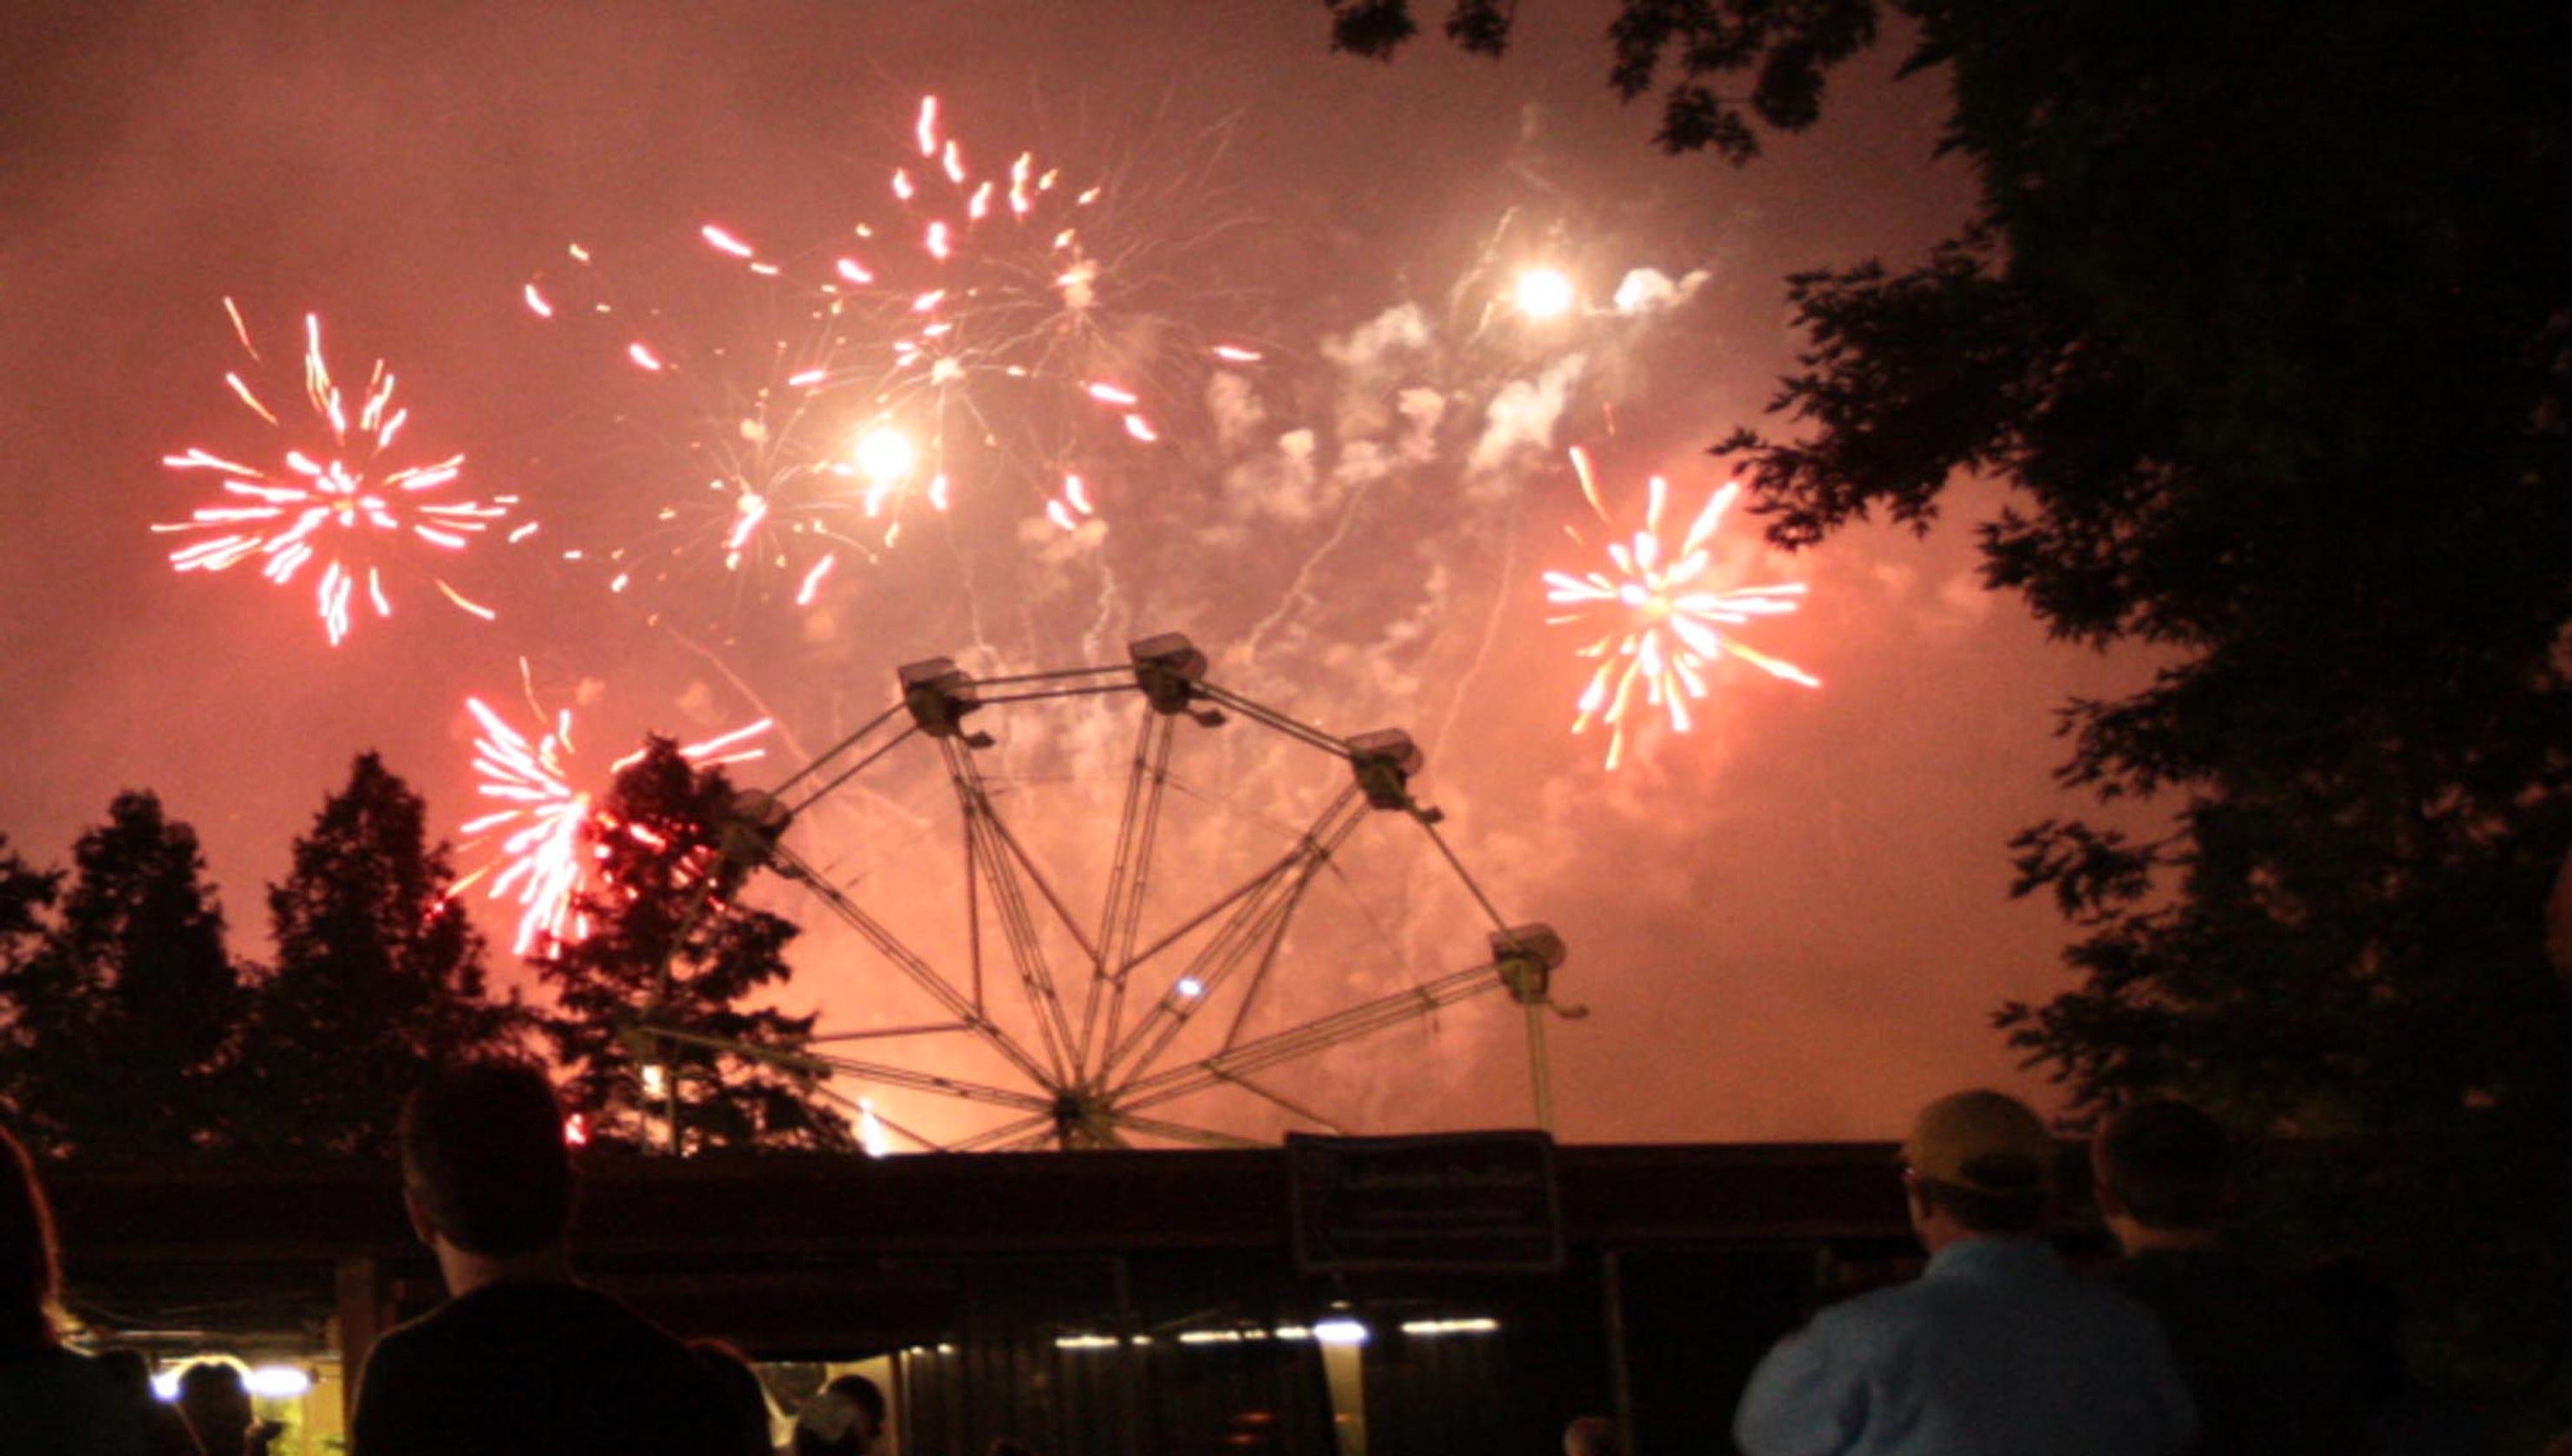 Coney Island to shut down all amusement park rides - Cincinnati.com